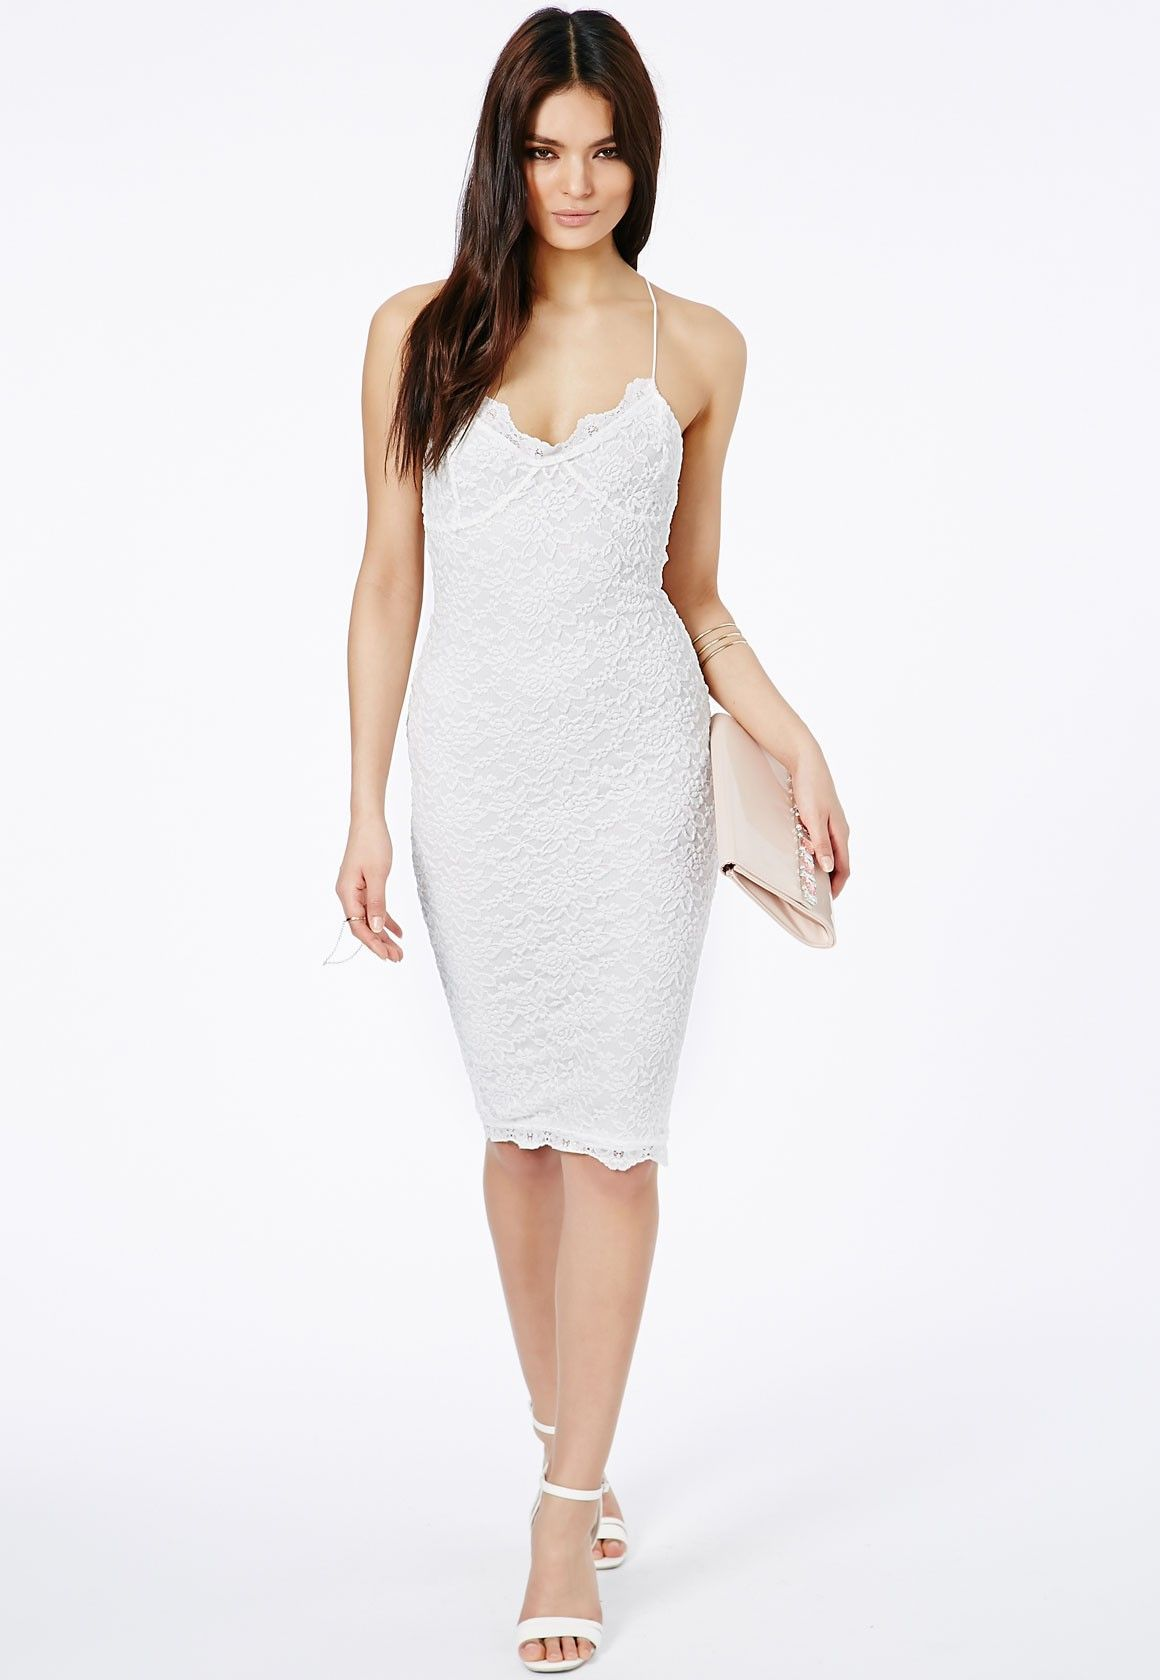 deae9c786812 Missguided - Zoraide Lace Strappy Midi Dress